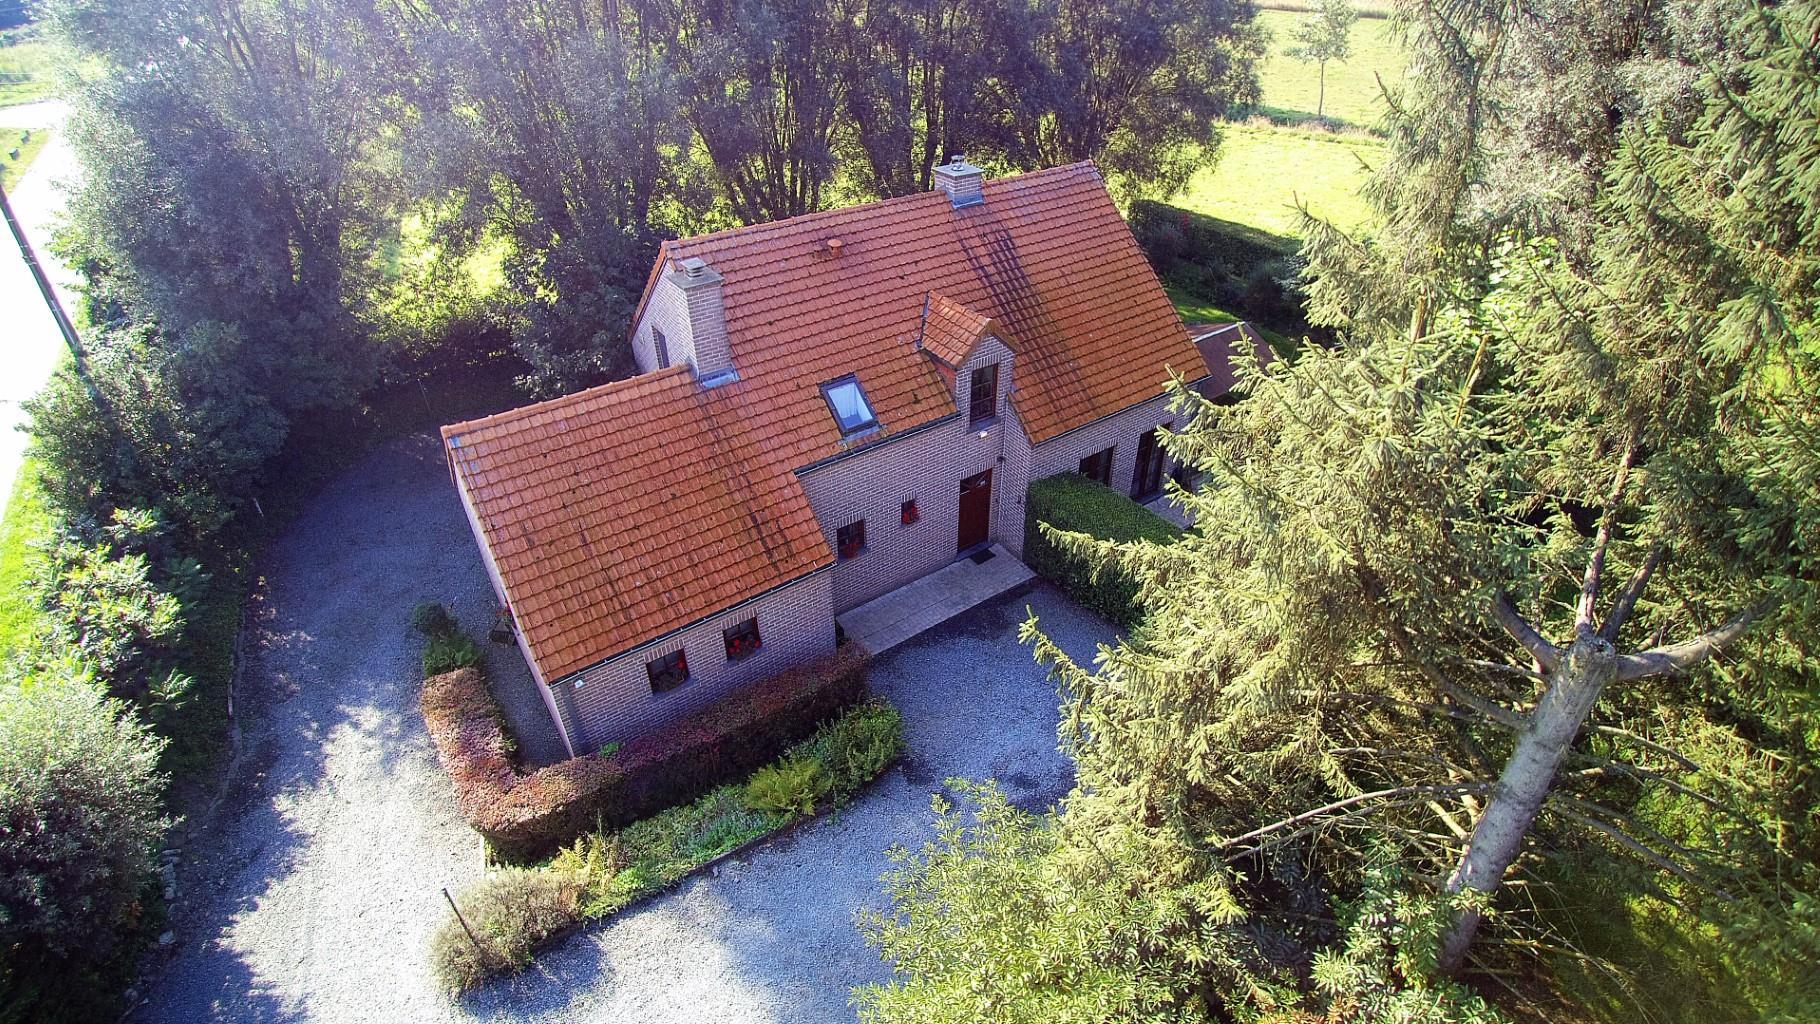 Villa - Braine-le-Comte Petit-Roeulxlez-Braine - #3029346-15